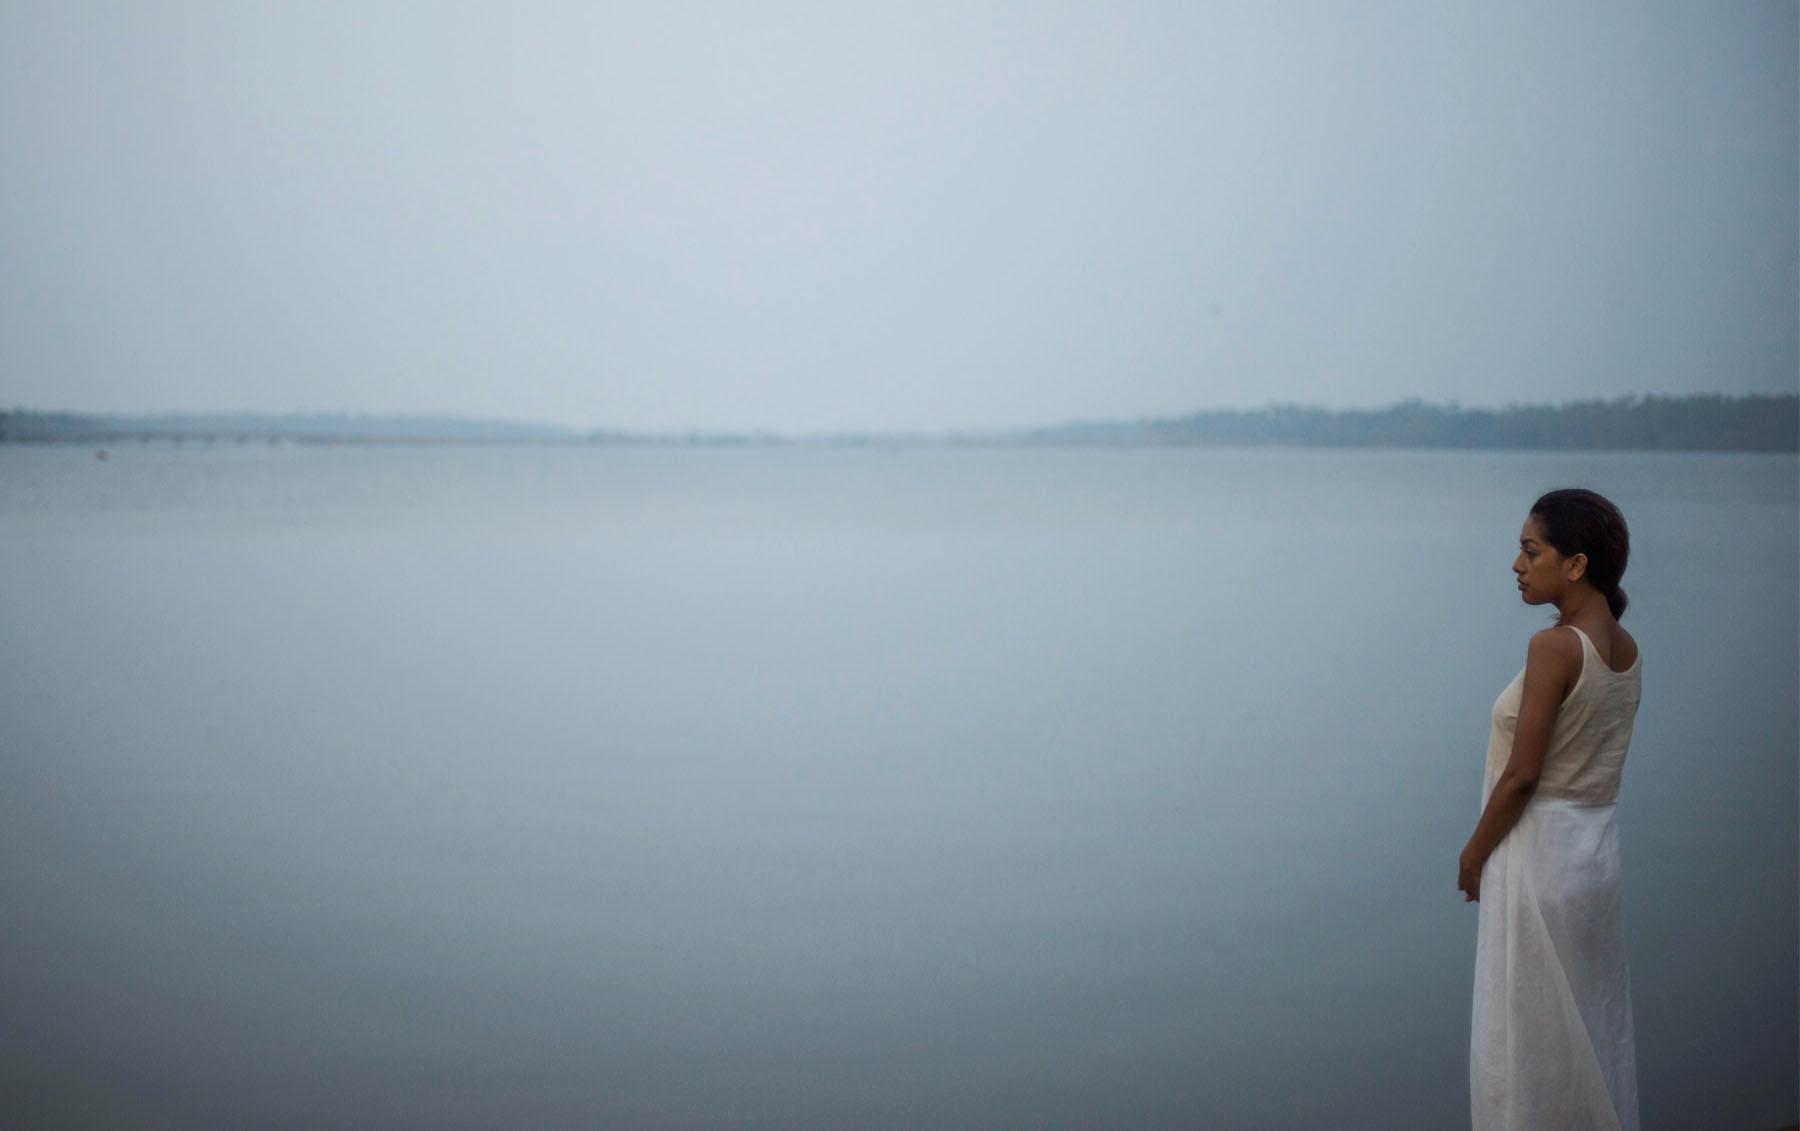 kalrai-rasayana-health-resort-india-meditative-thinking